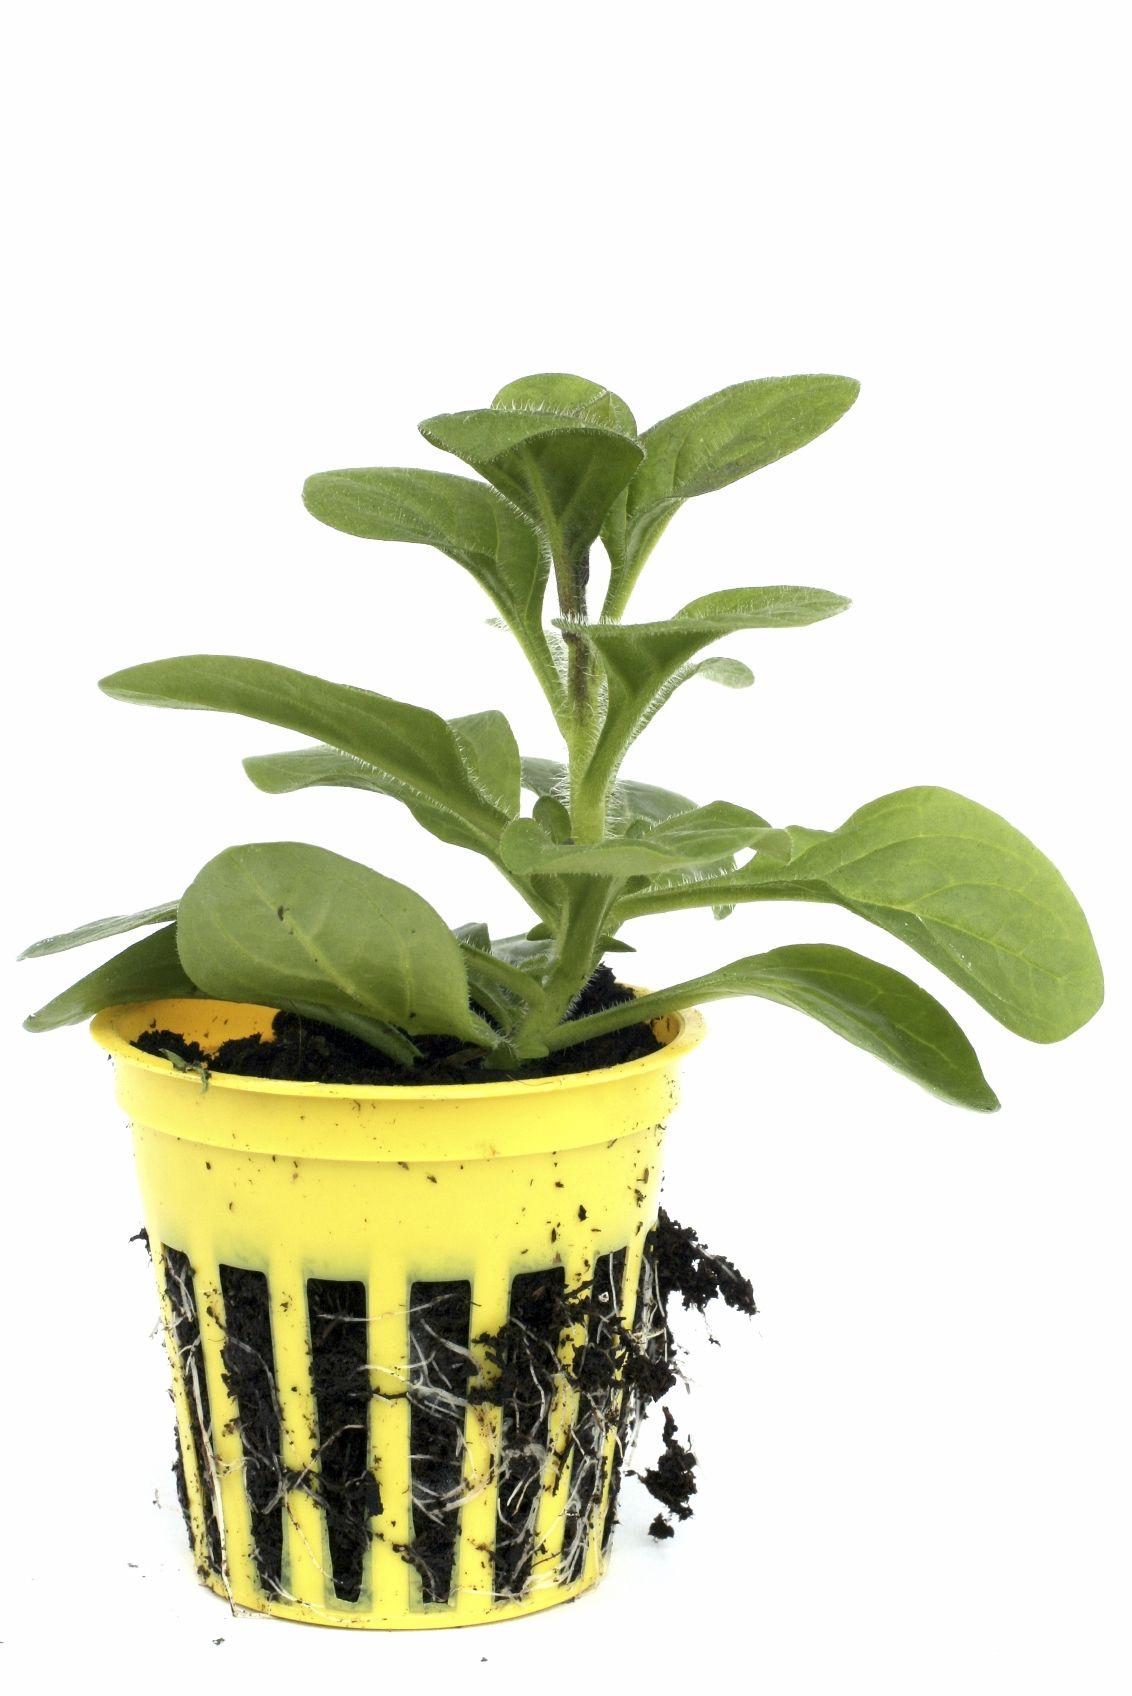 petunia winter care u2013 can you overwinter a petunia plant